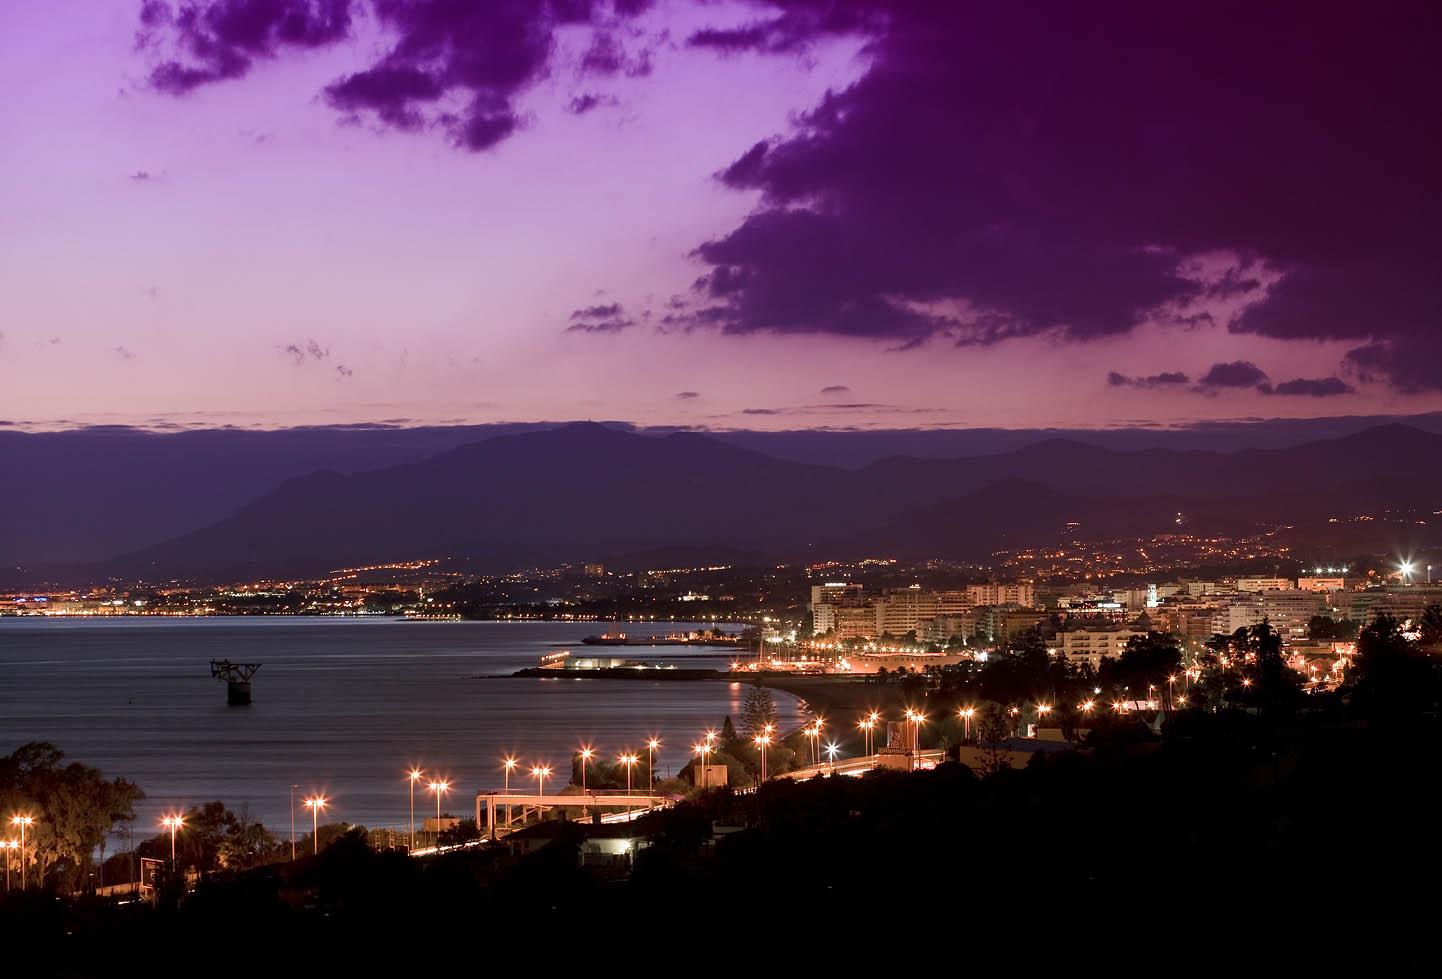 Marbella revives its international image